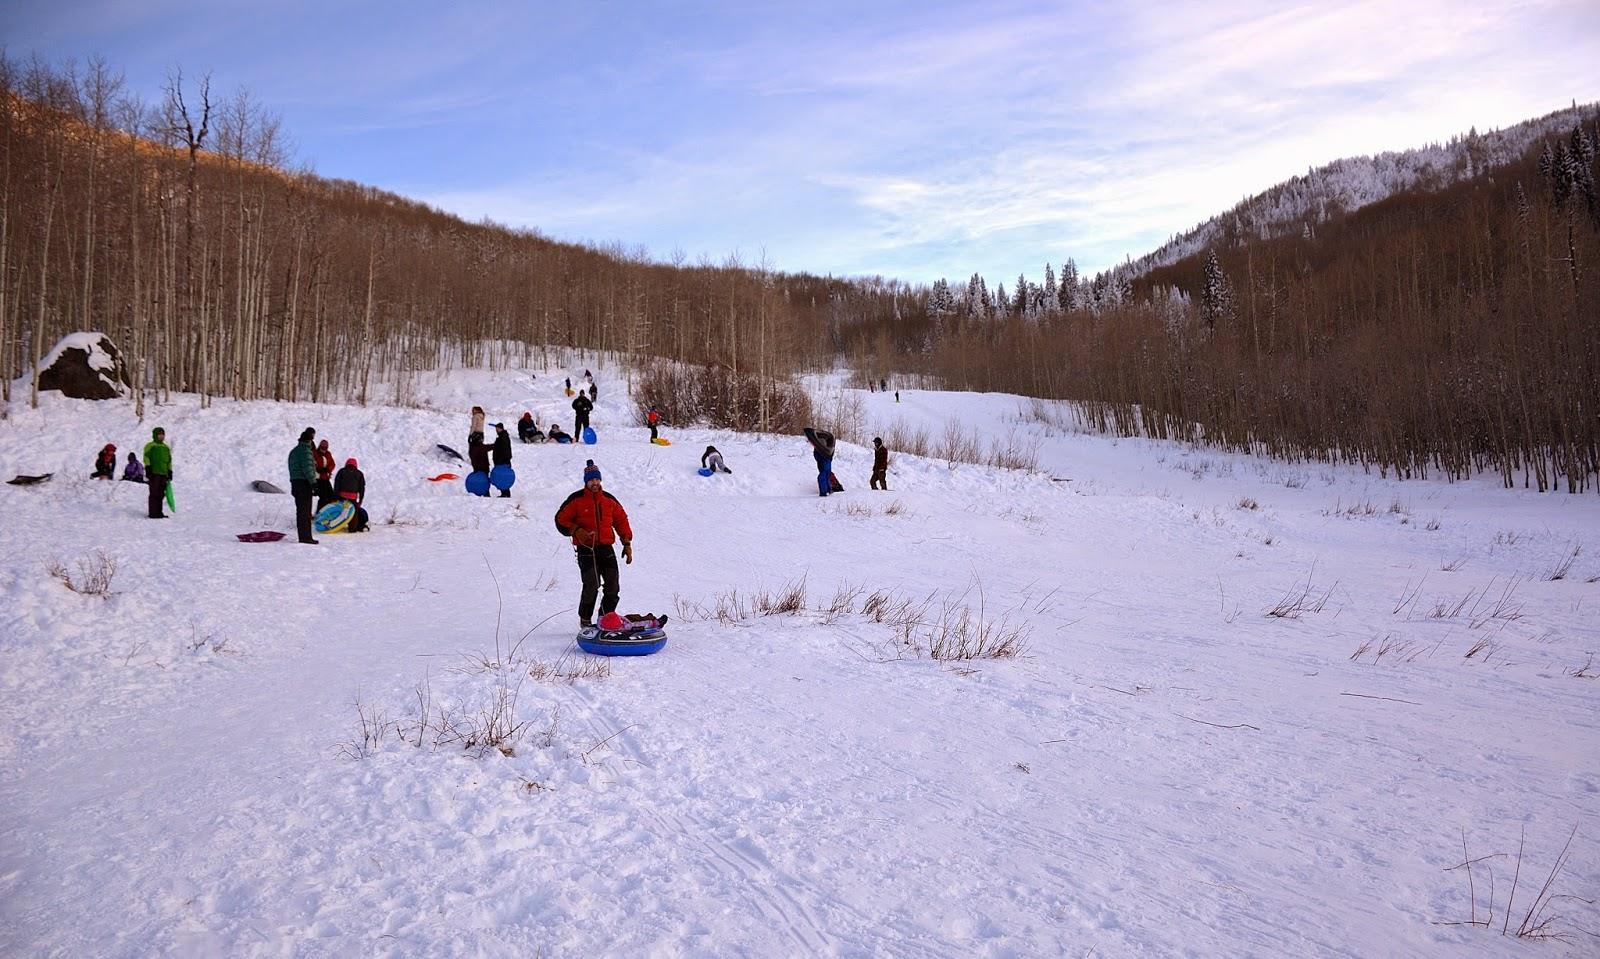 Gentle slope for sledding